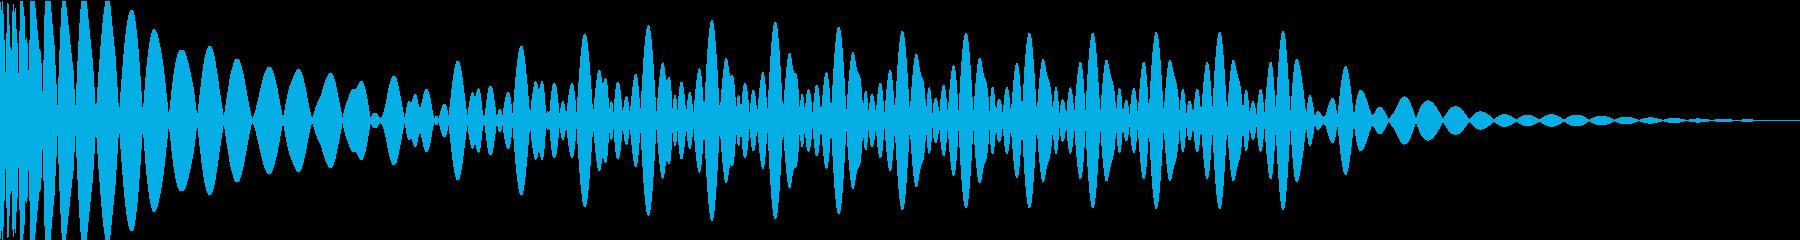 EDMキック キーEの再生済みの波形